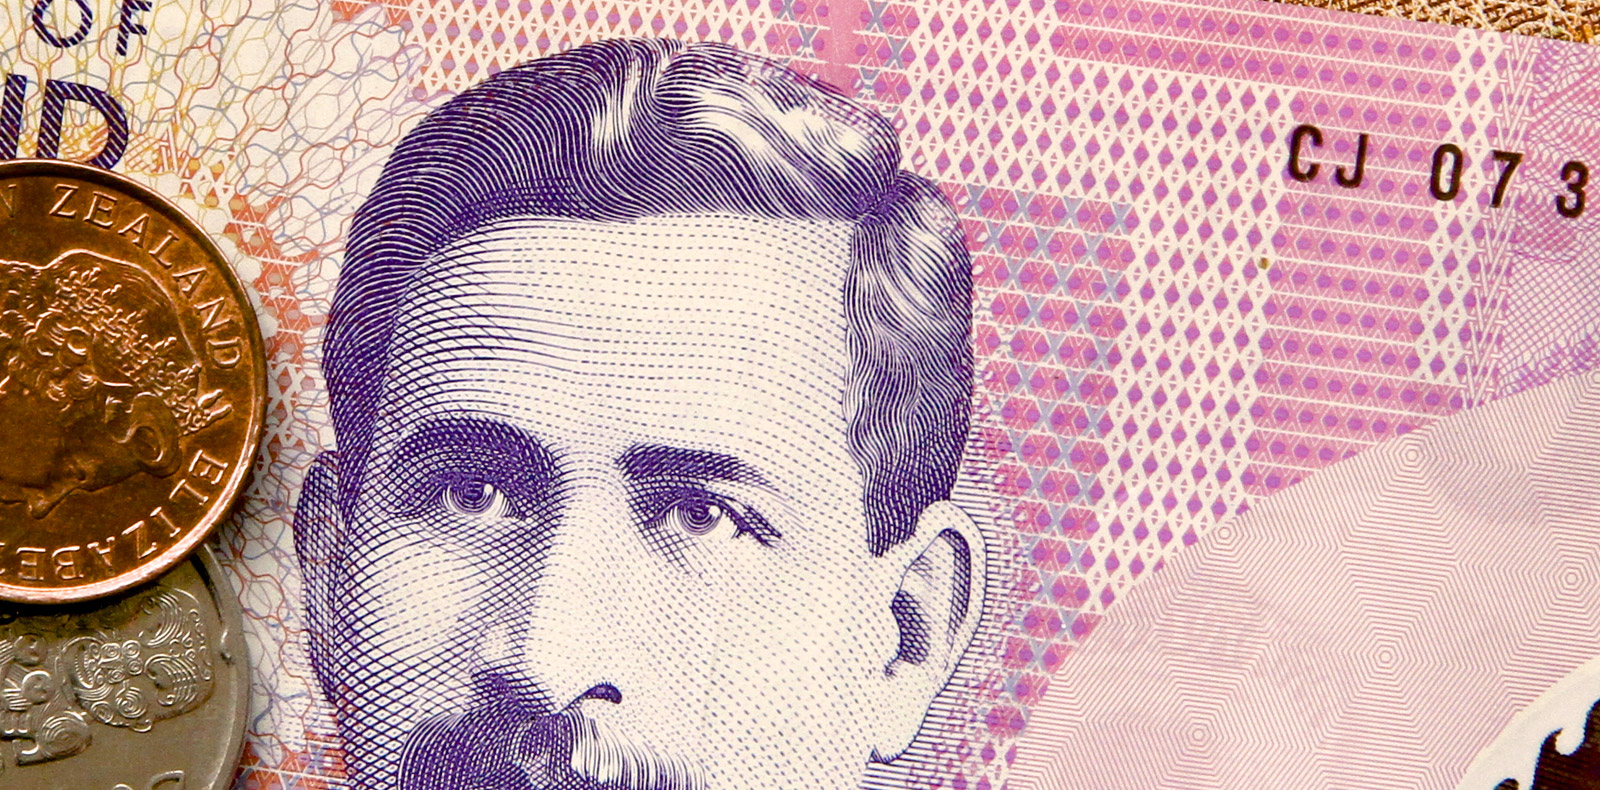 NZ Dollar to gain on growth improvements